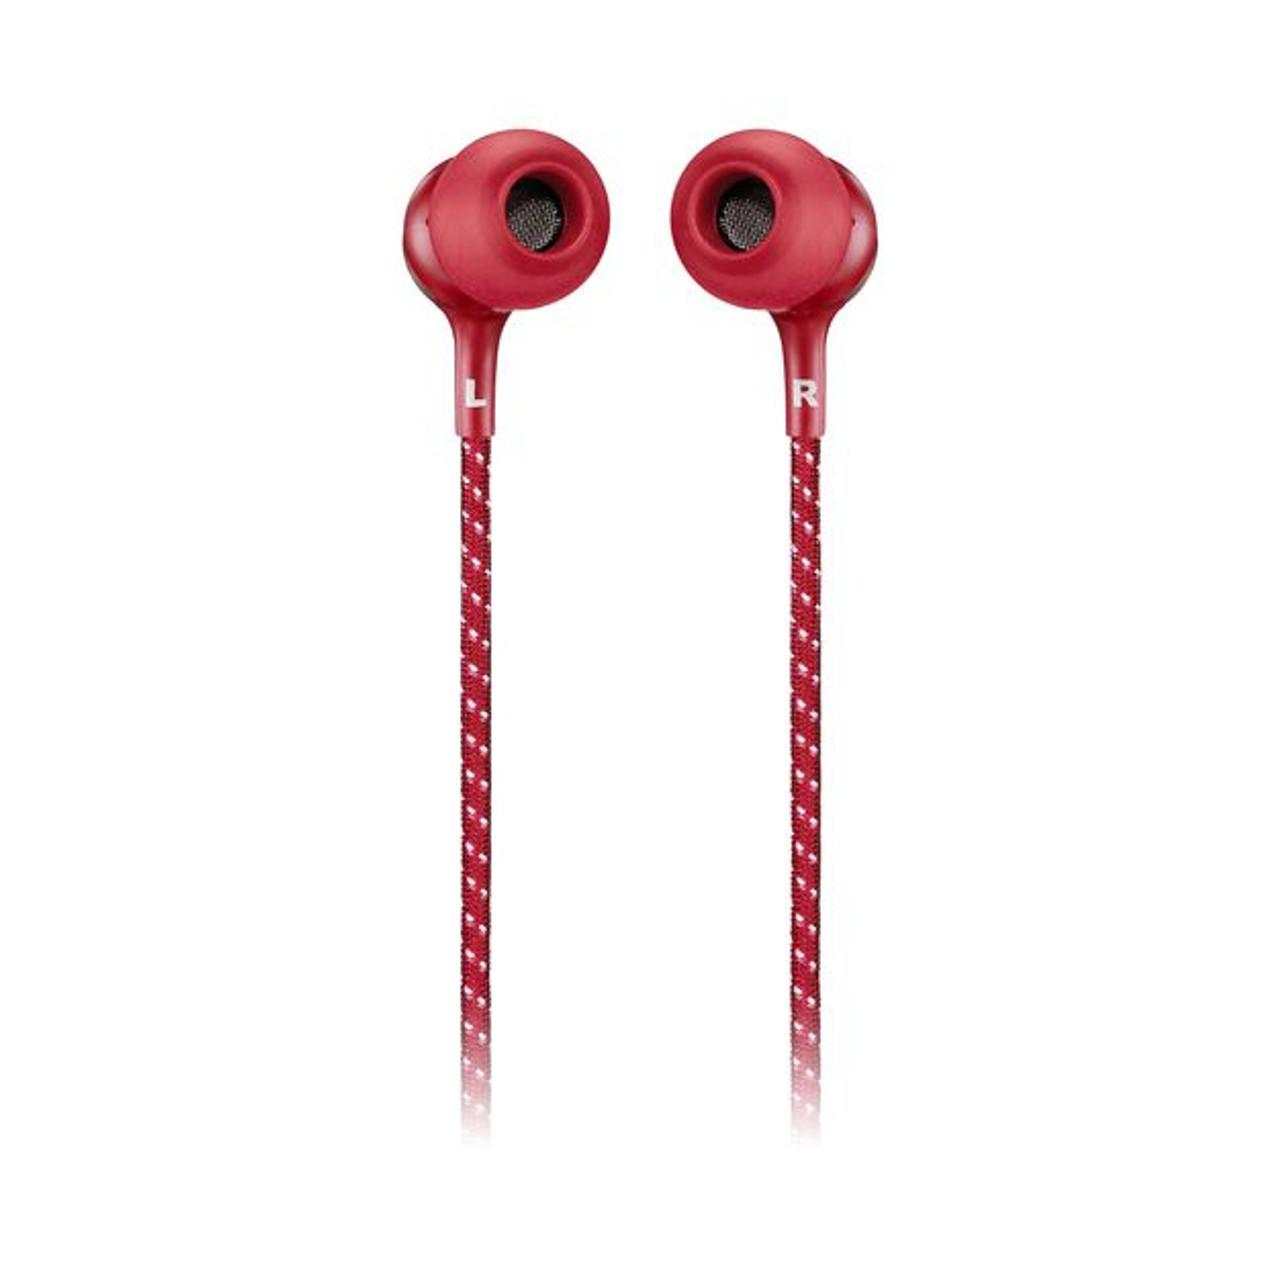 JBL Live 200BT Wireless Bluetooth® neckband earbuds